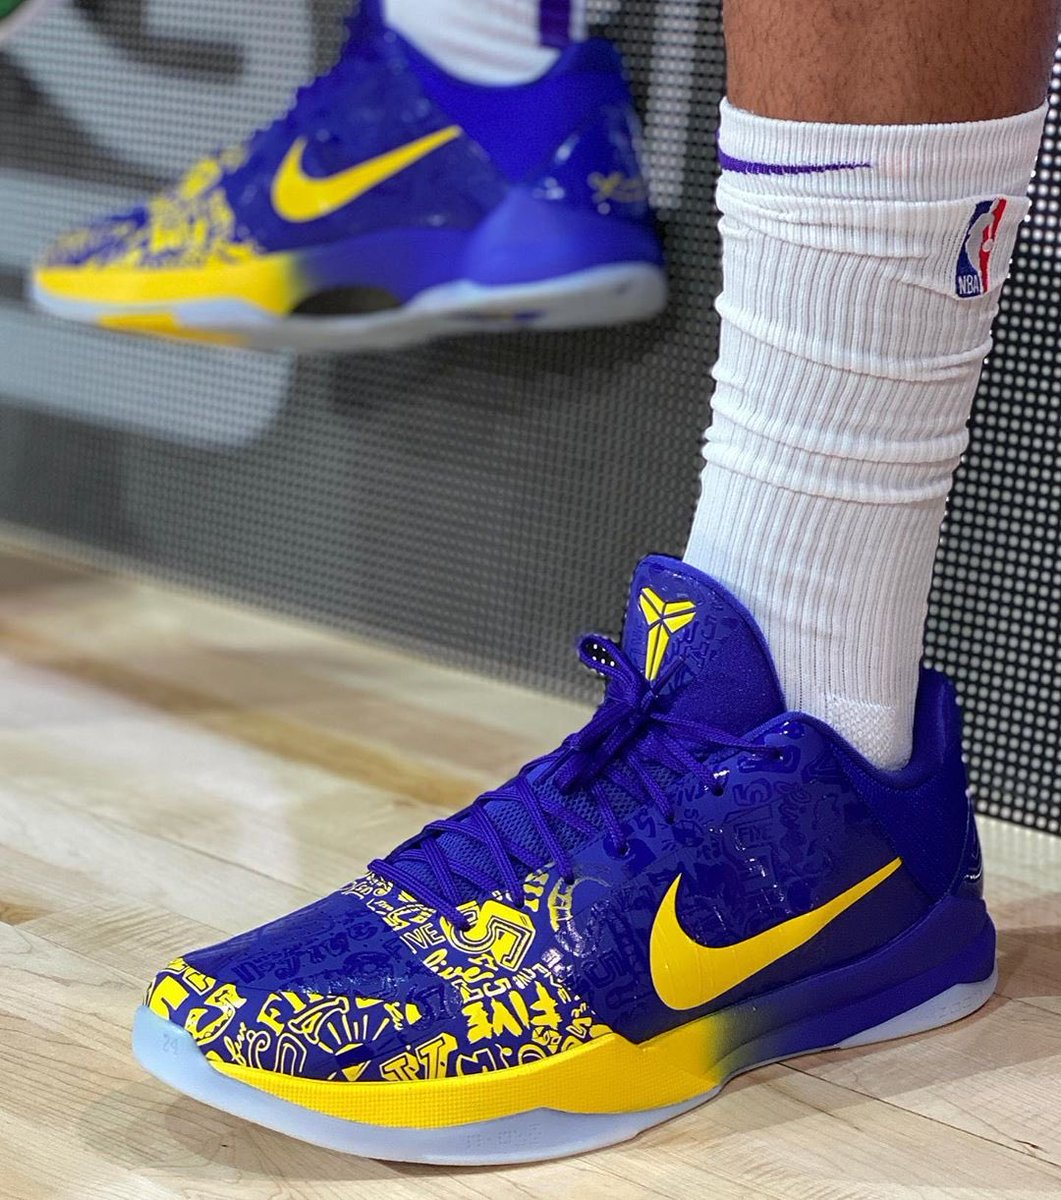 Nick Depaula On Twitter Anthony Davis Is Wearing The 5 Rings Kobe 5 Tonight The Same Shoe Kobe Wore During The Lakers Ring Night Game 10 Years Ago Nbakicks Https T Co 0ljf1sasxk